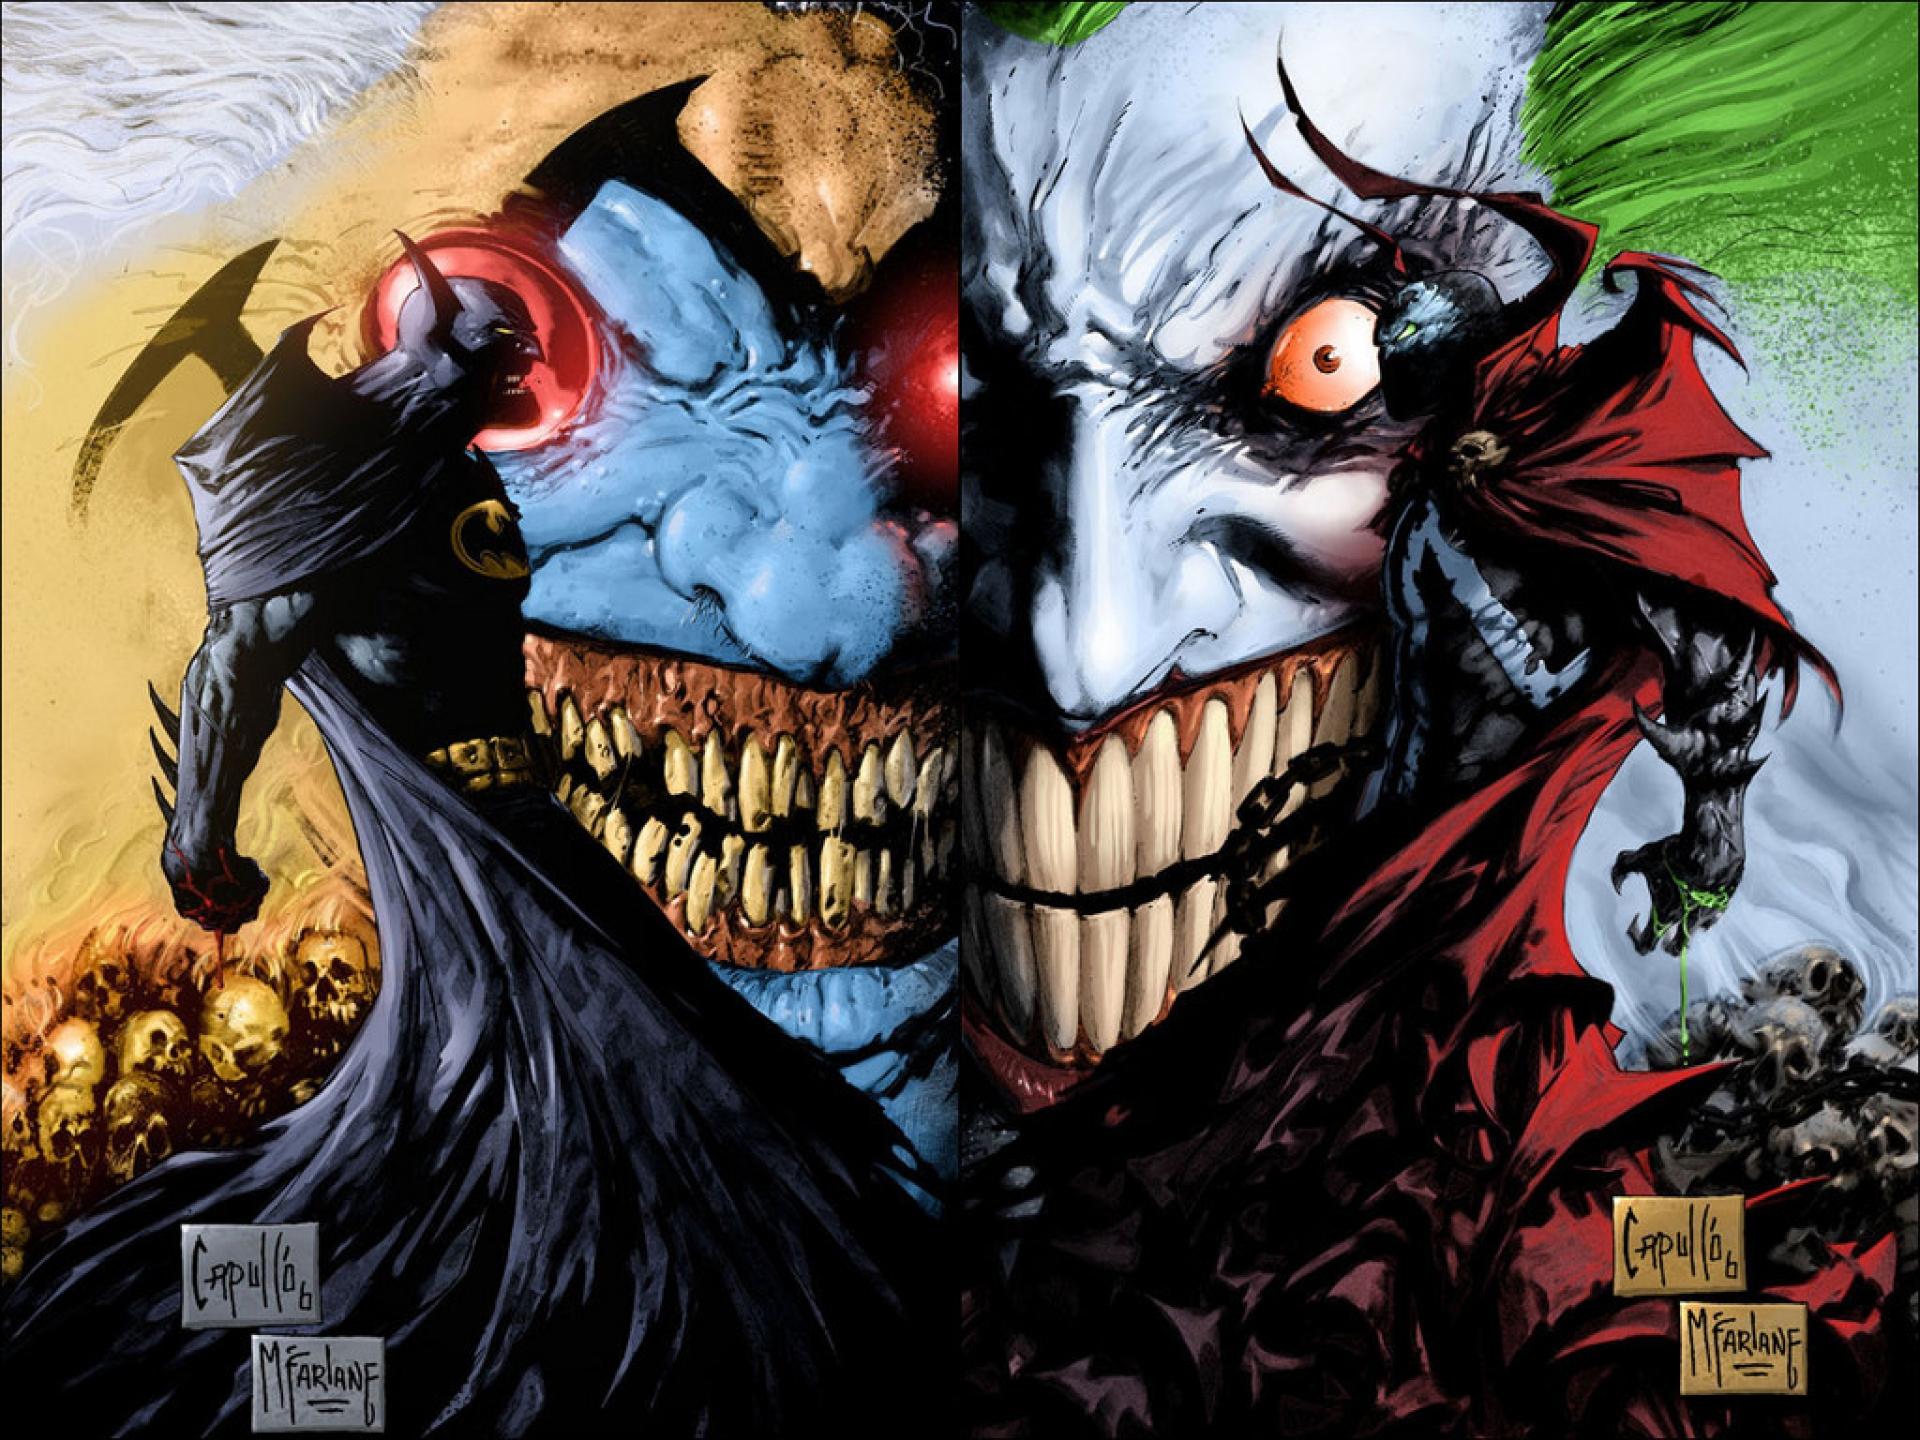 Drak Batman Vs Superman Wallpaper Picture Wallpaper with 1920x1440 1920x1440